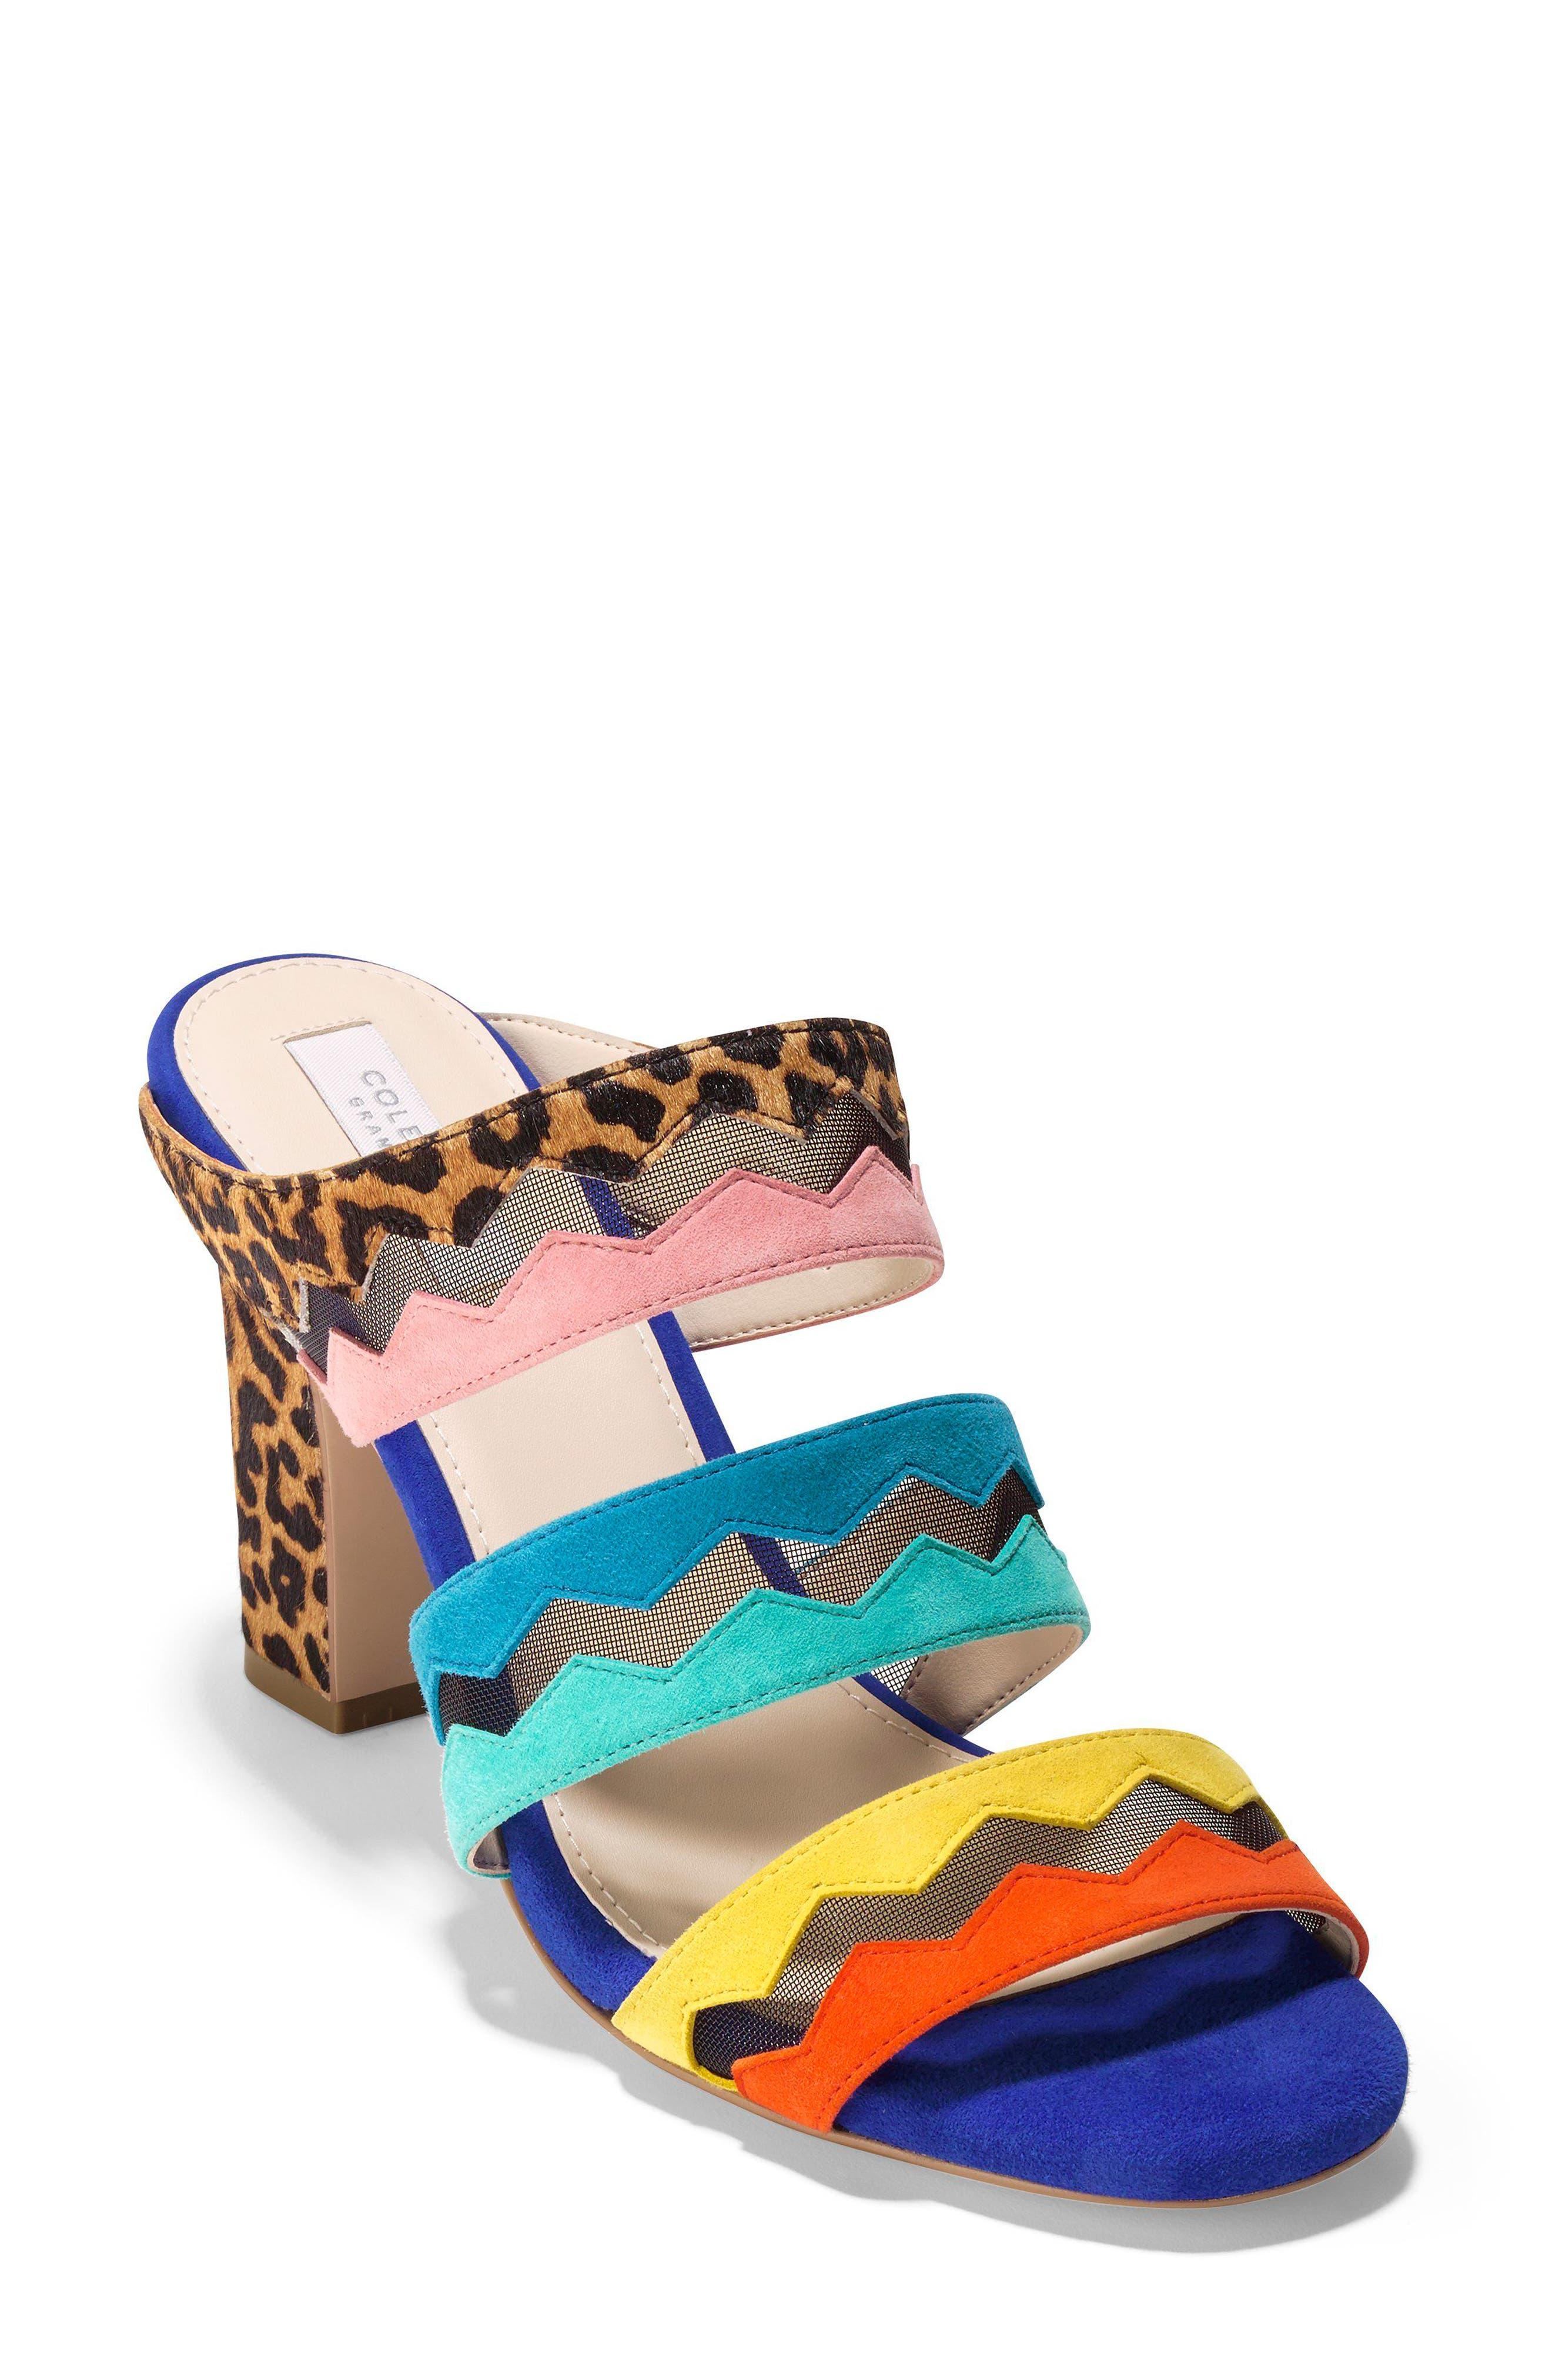 Emilia Sandal,                         Main,                         color, Ocelot Print Calf Hair